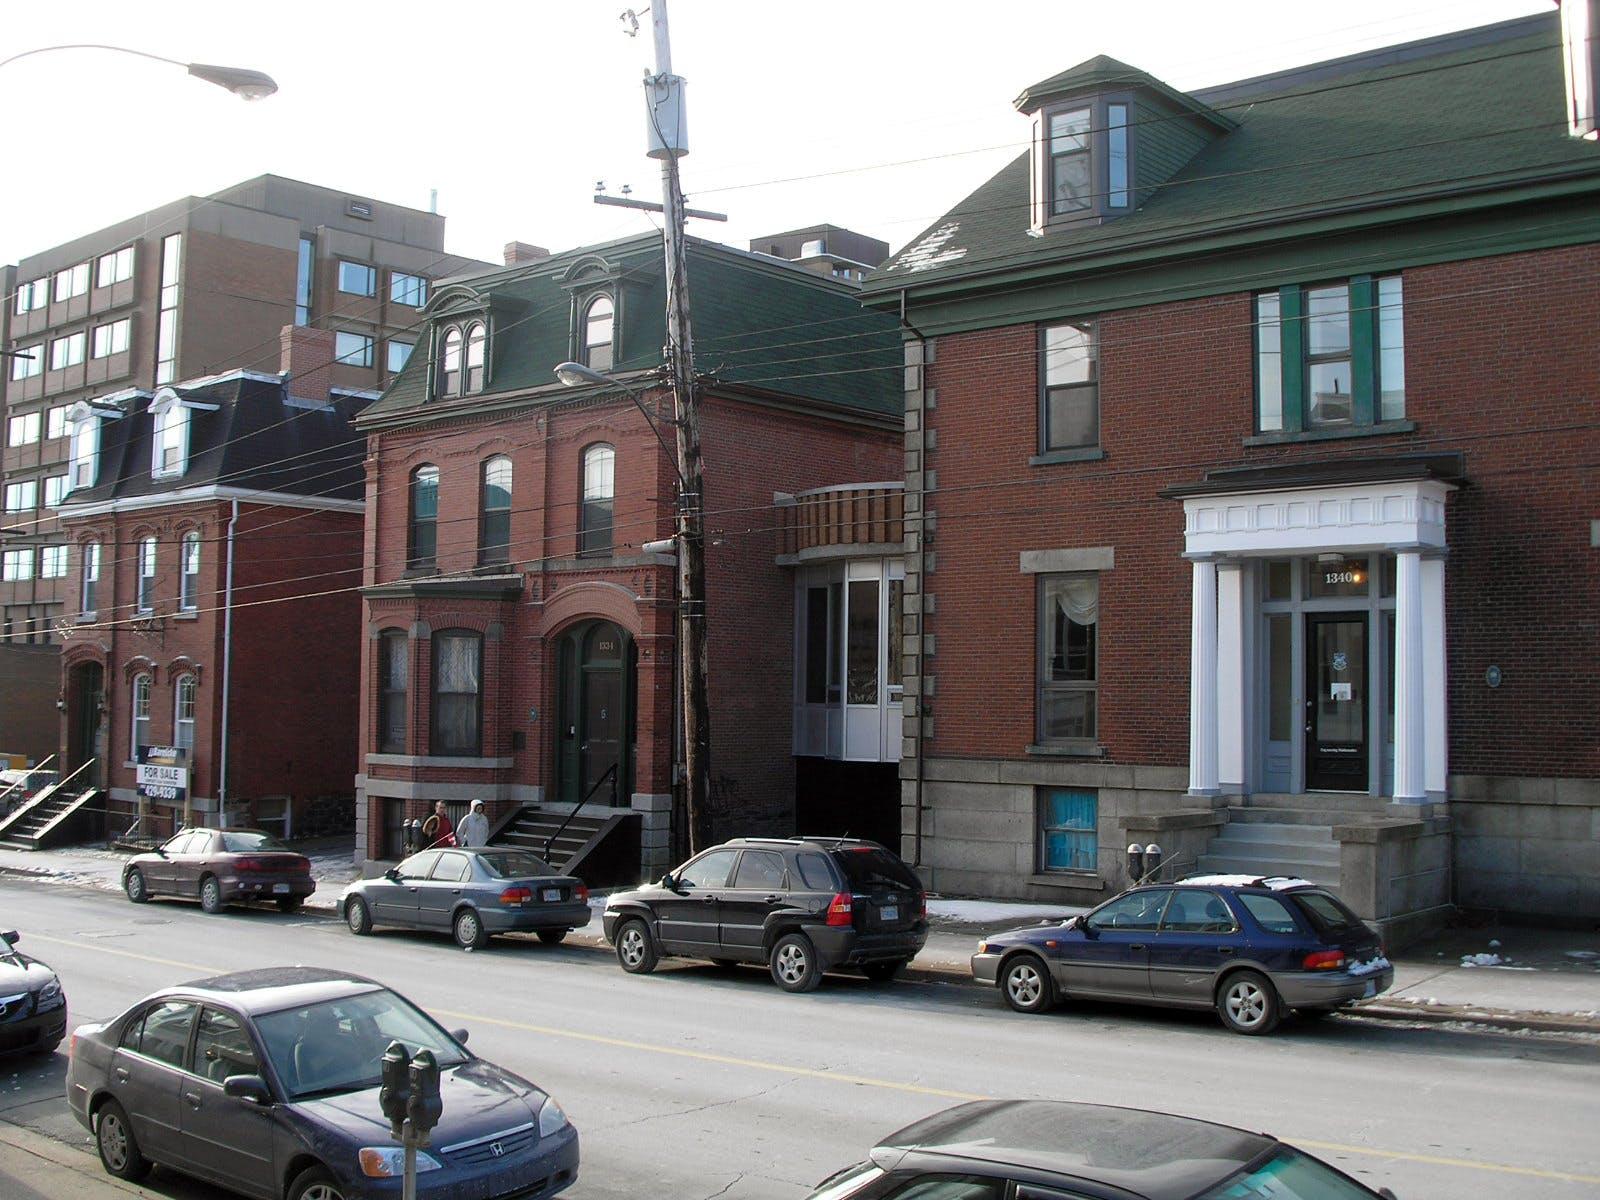 Three brick buildings along Barrington Street